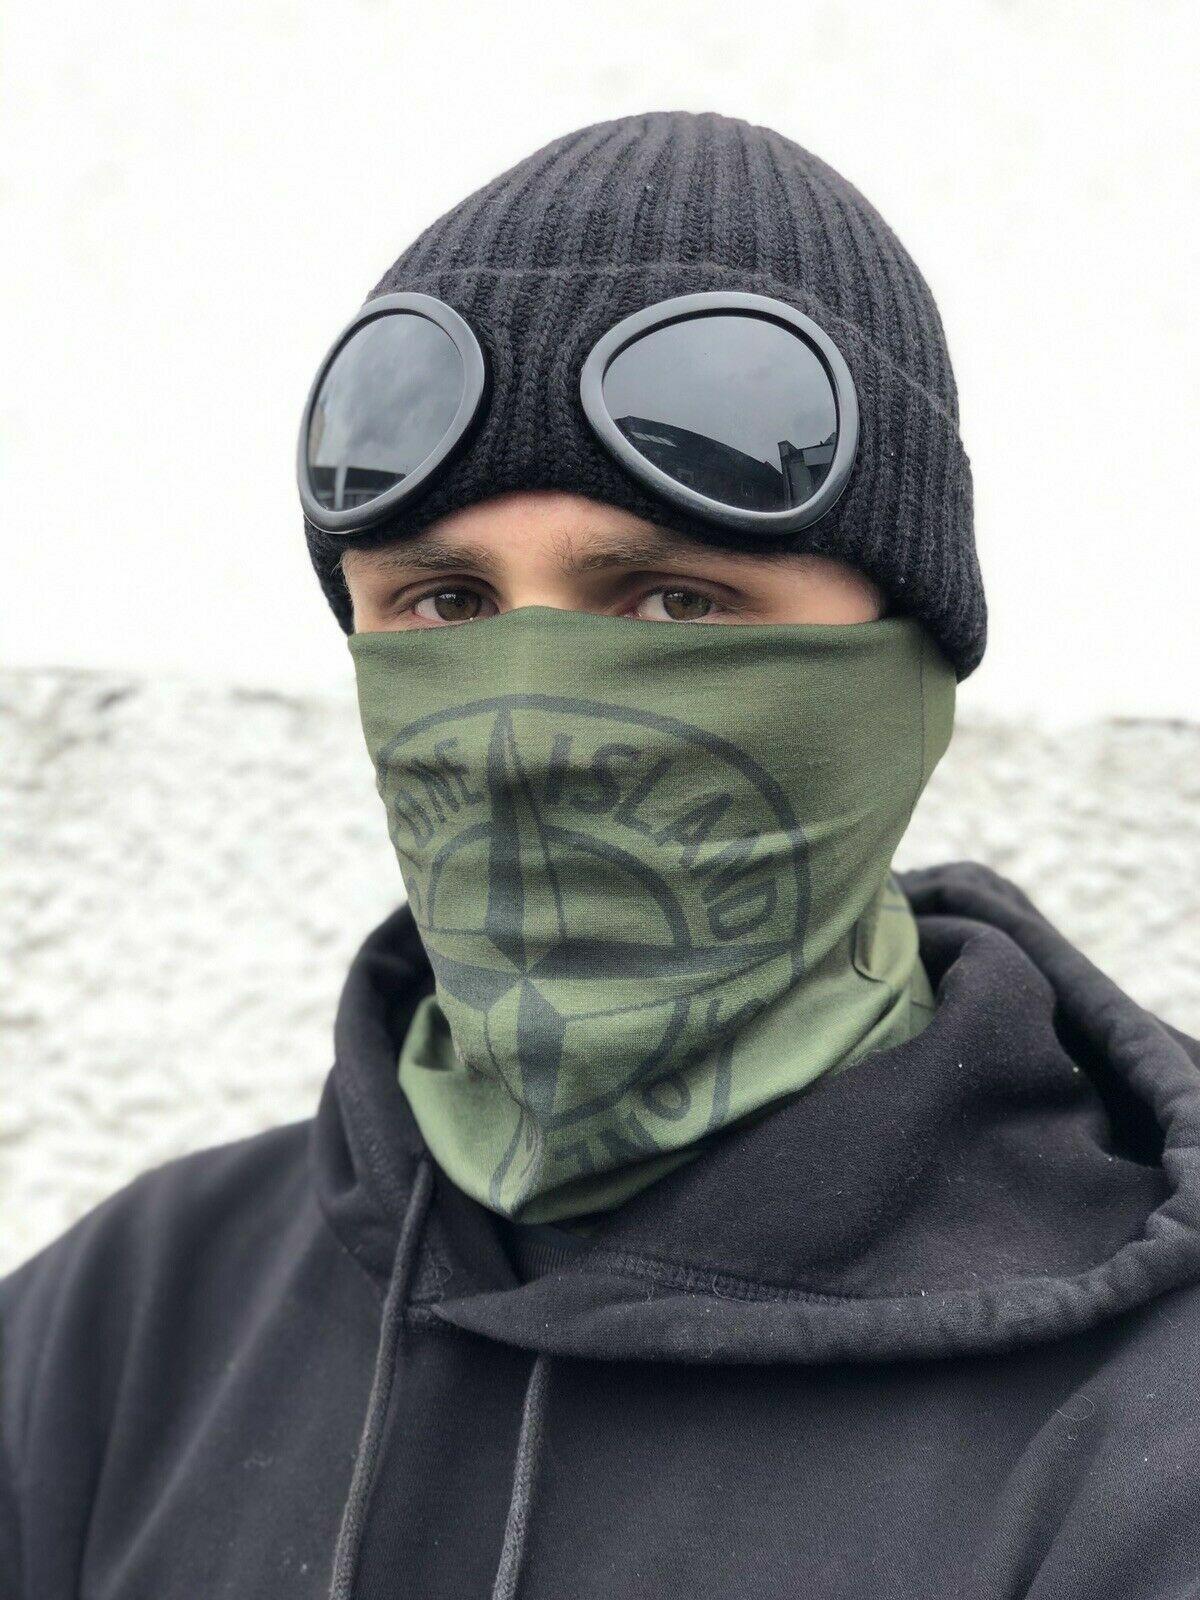 Khaki Stone Island Pattern Multi-use Balaclava Face Mask Tube Headband